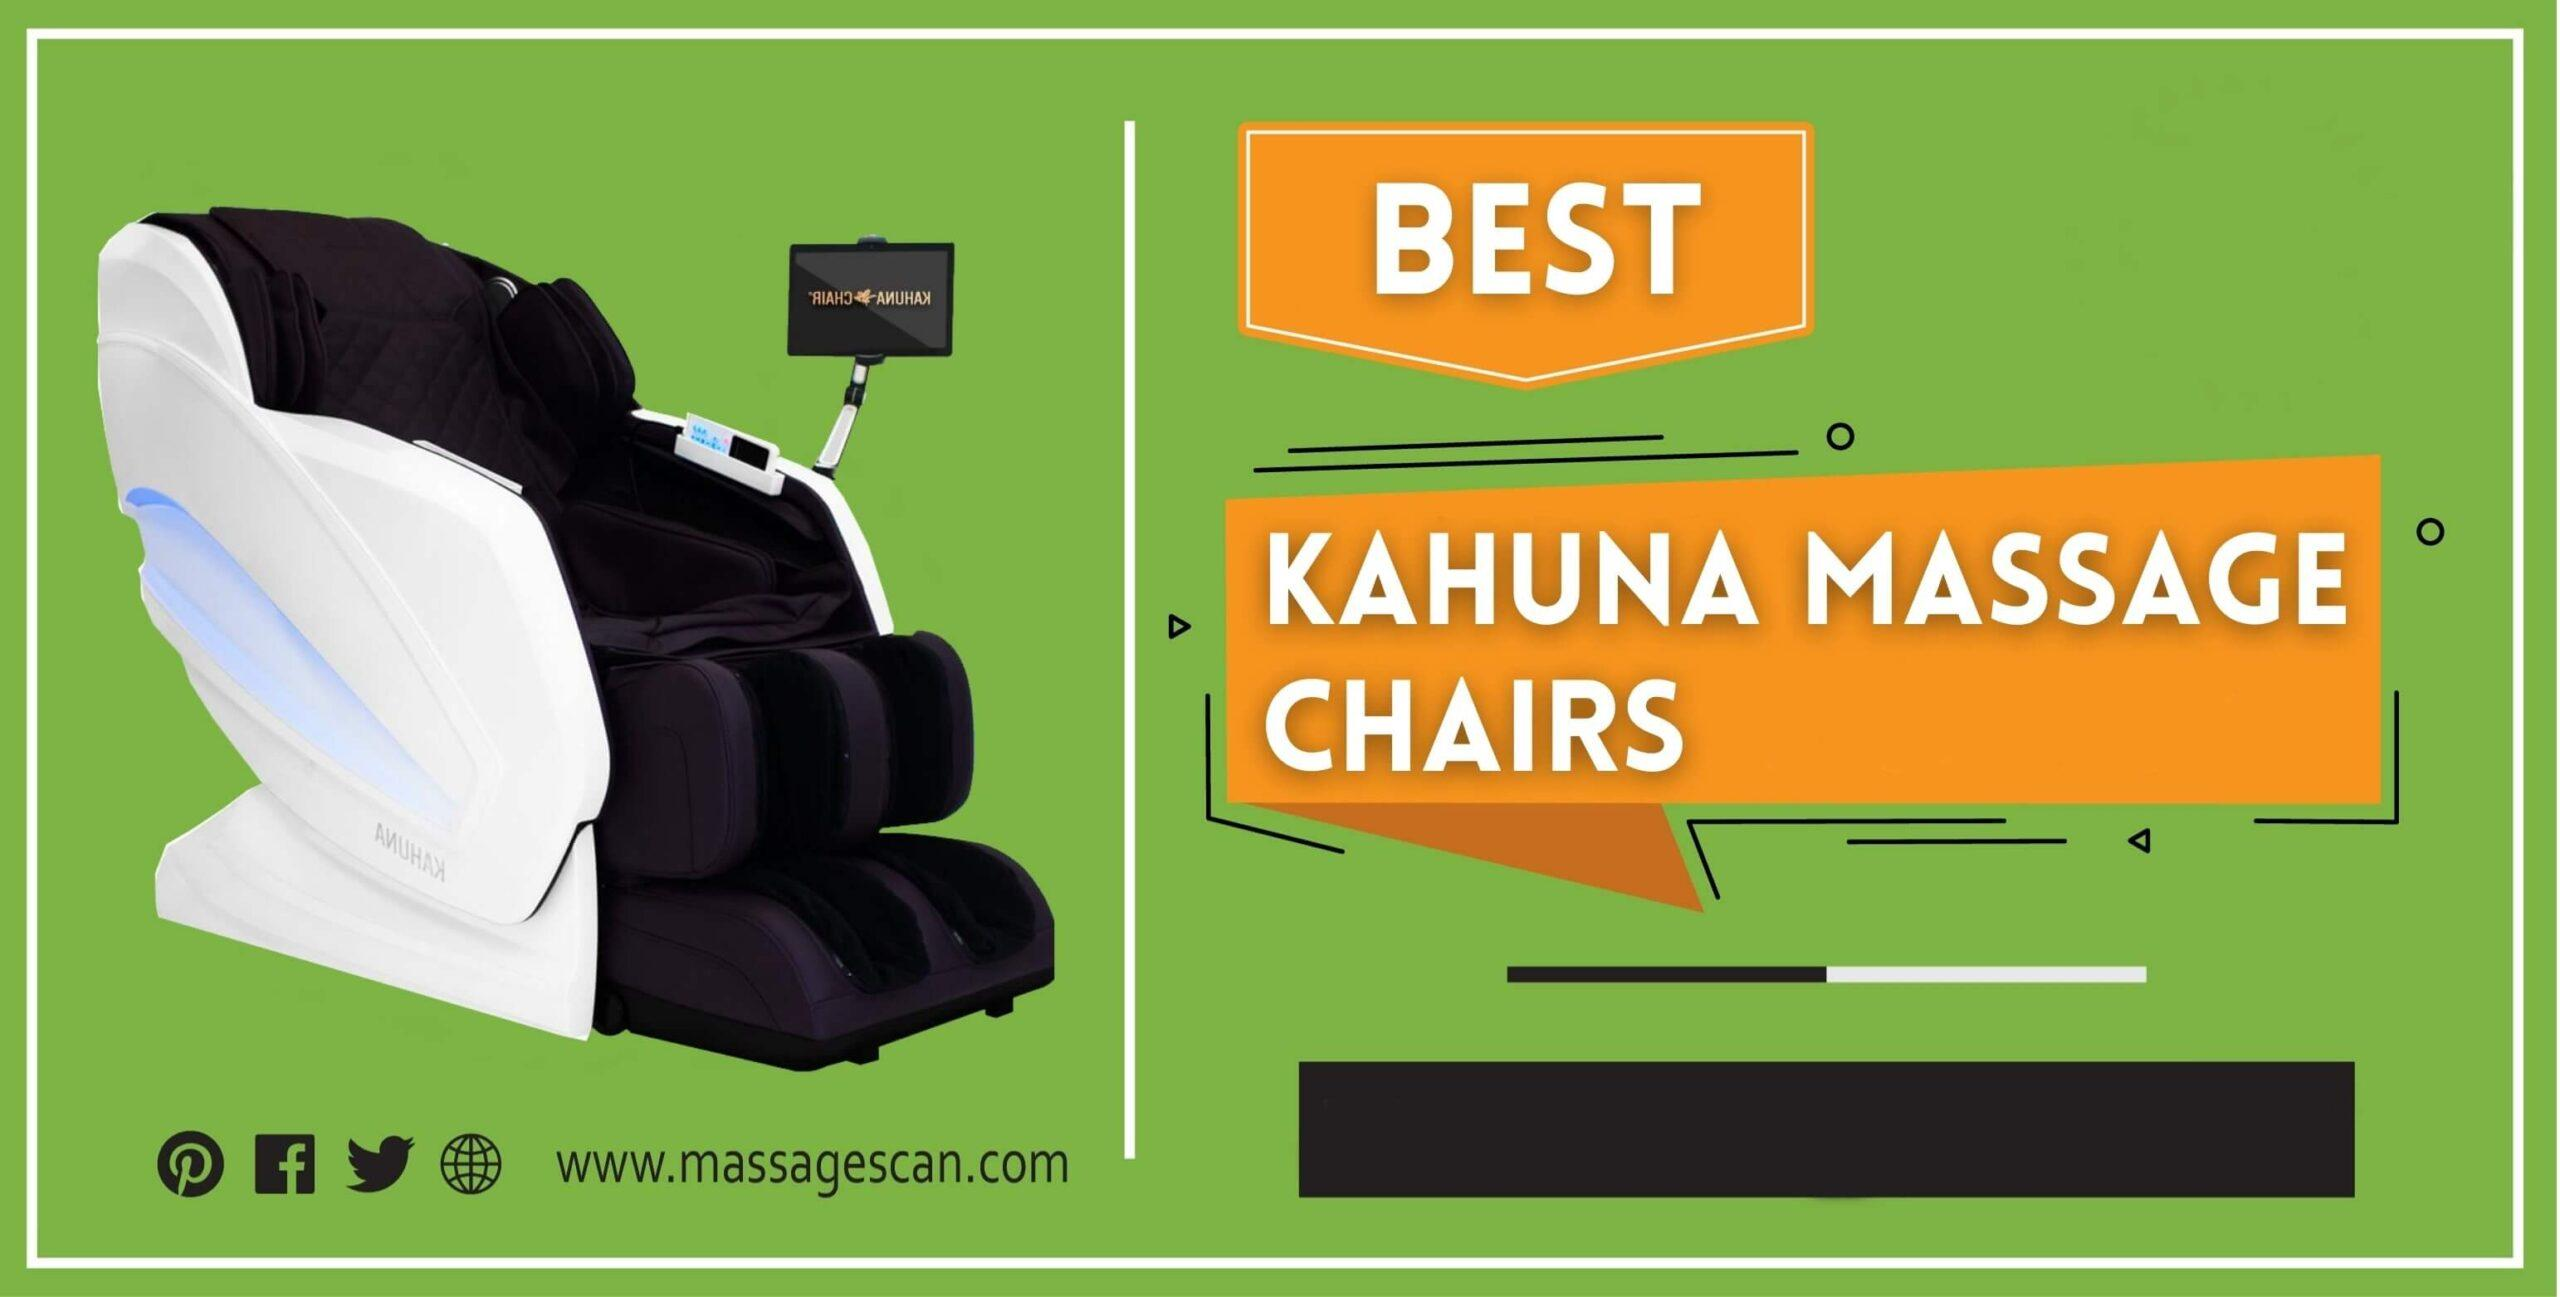 Best Kahuna Massage Chairs